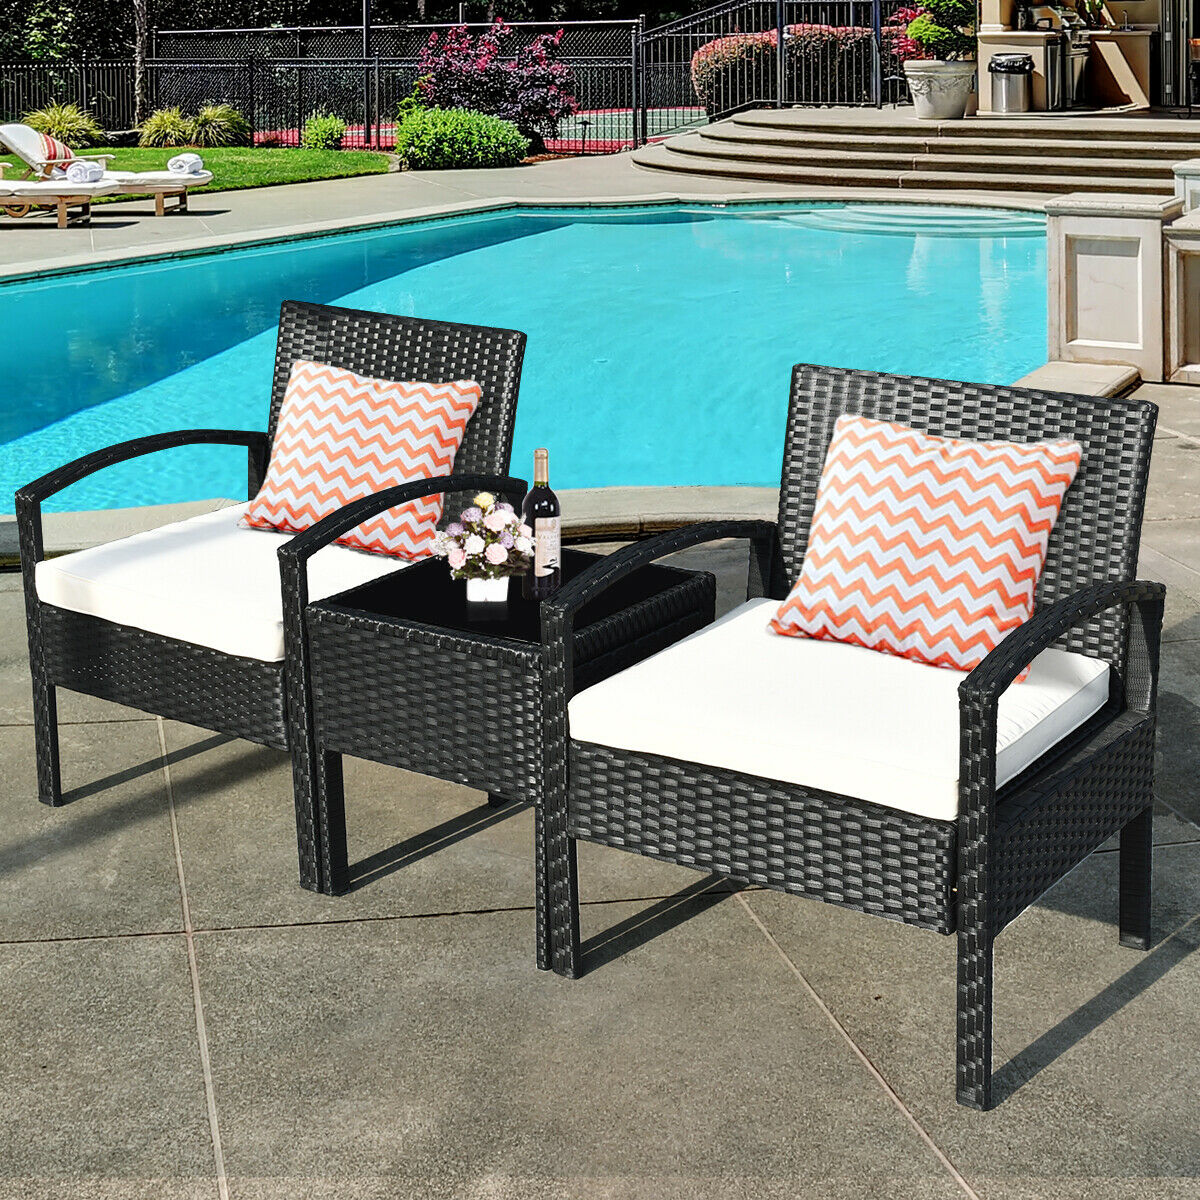 gymax 3pcs patio rattan furniture